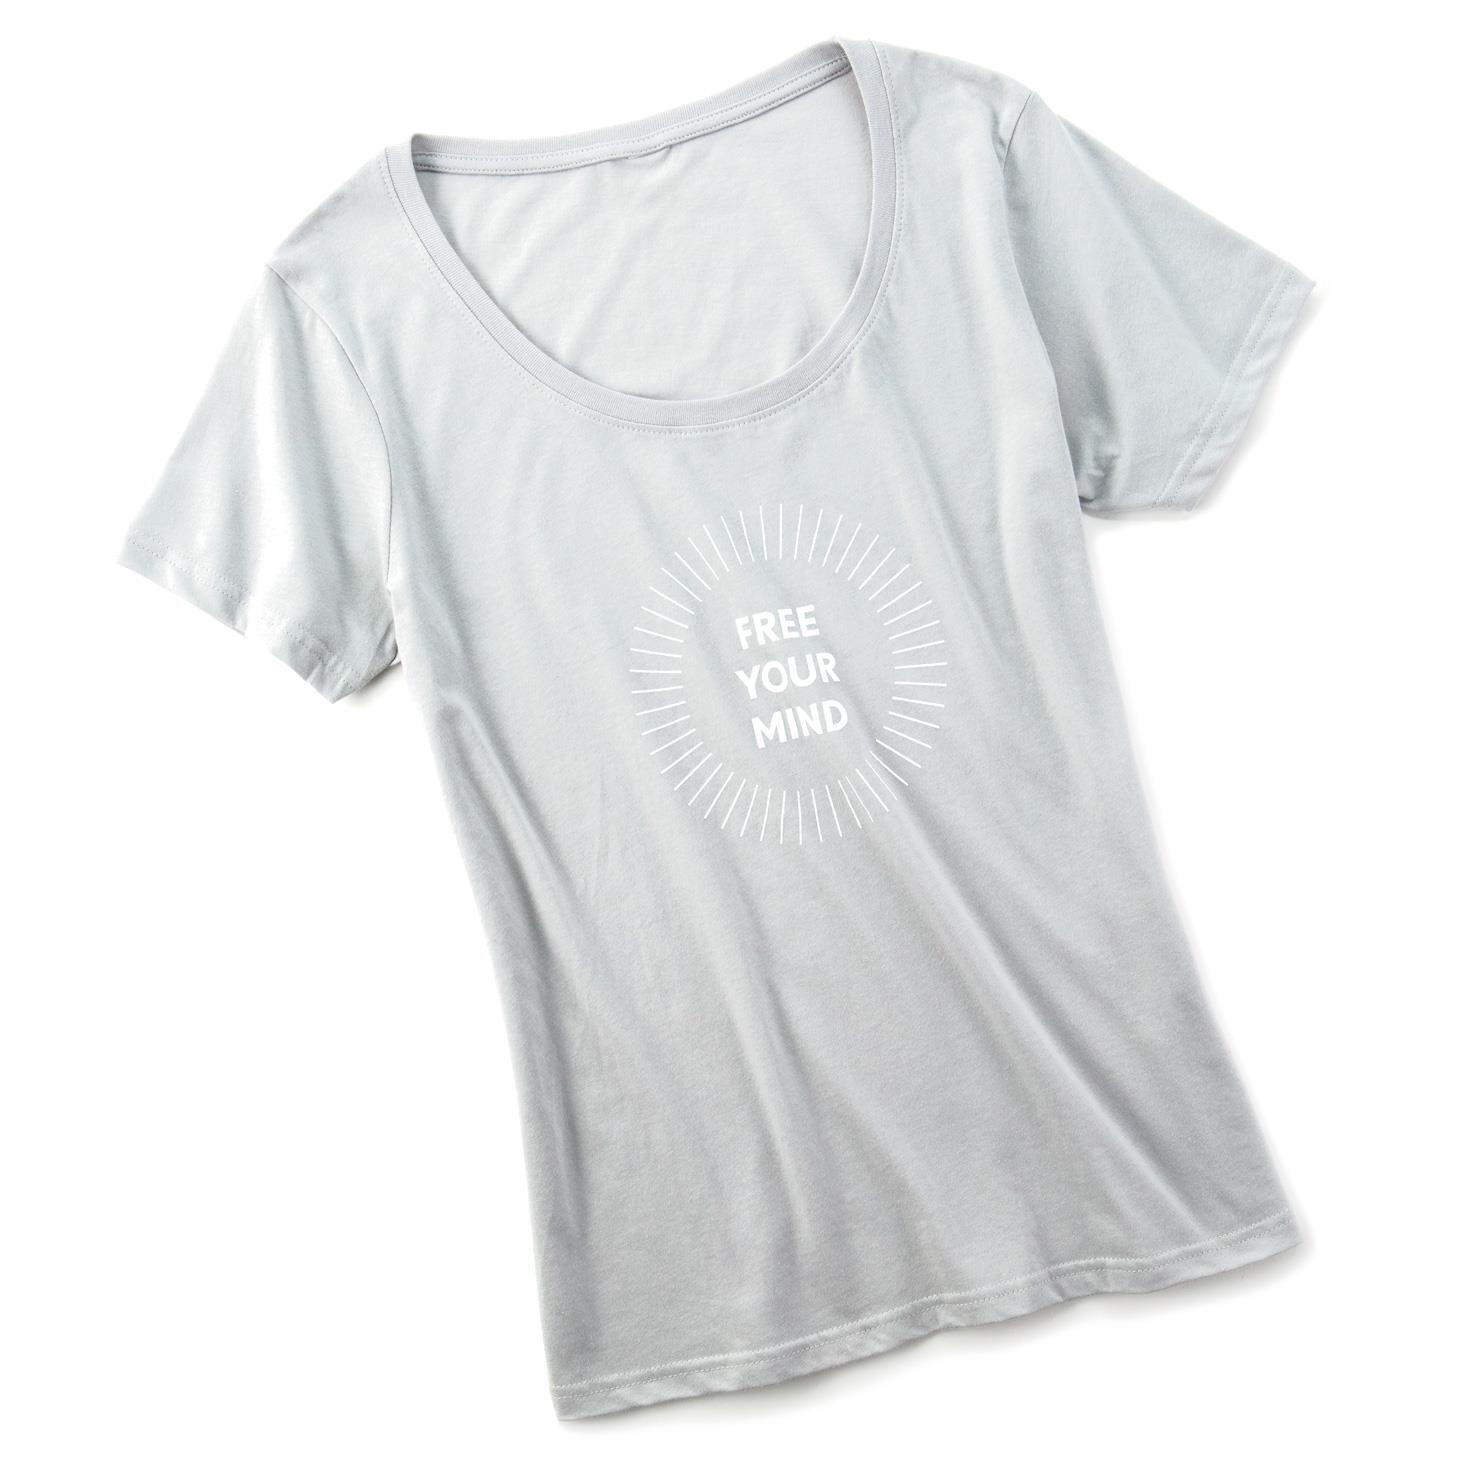 Design your own hello kitty t-shirt - Design Your Own Hello Kitty T-shirt 81